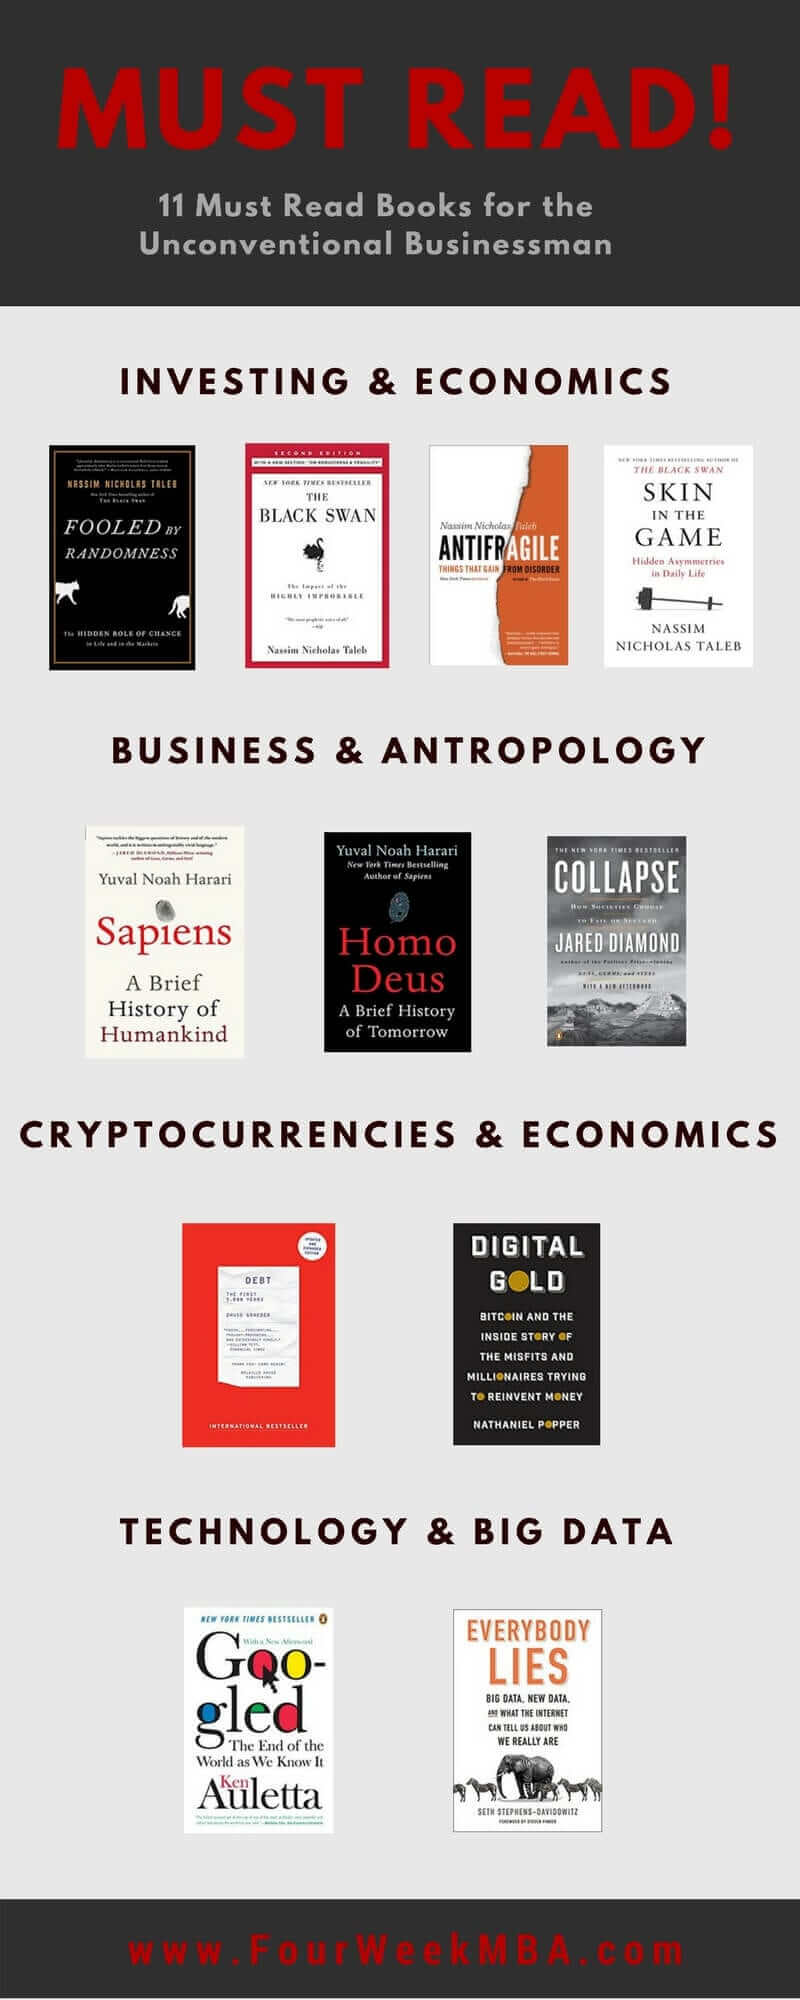 must-read-books-unconventional-businessman